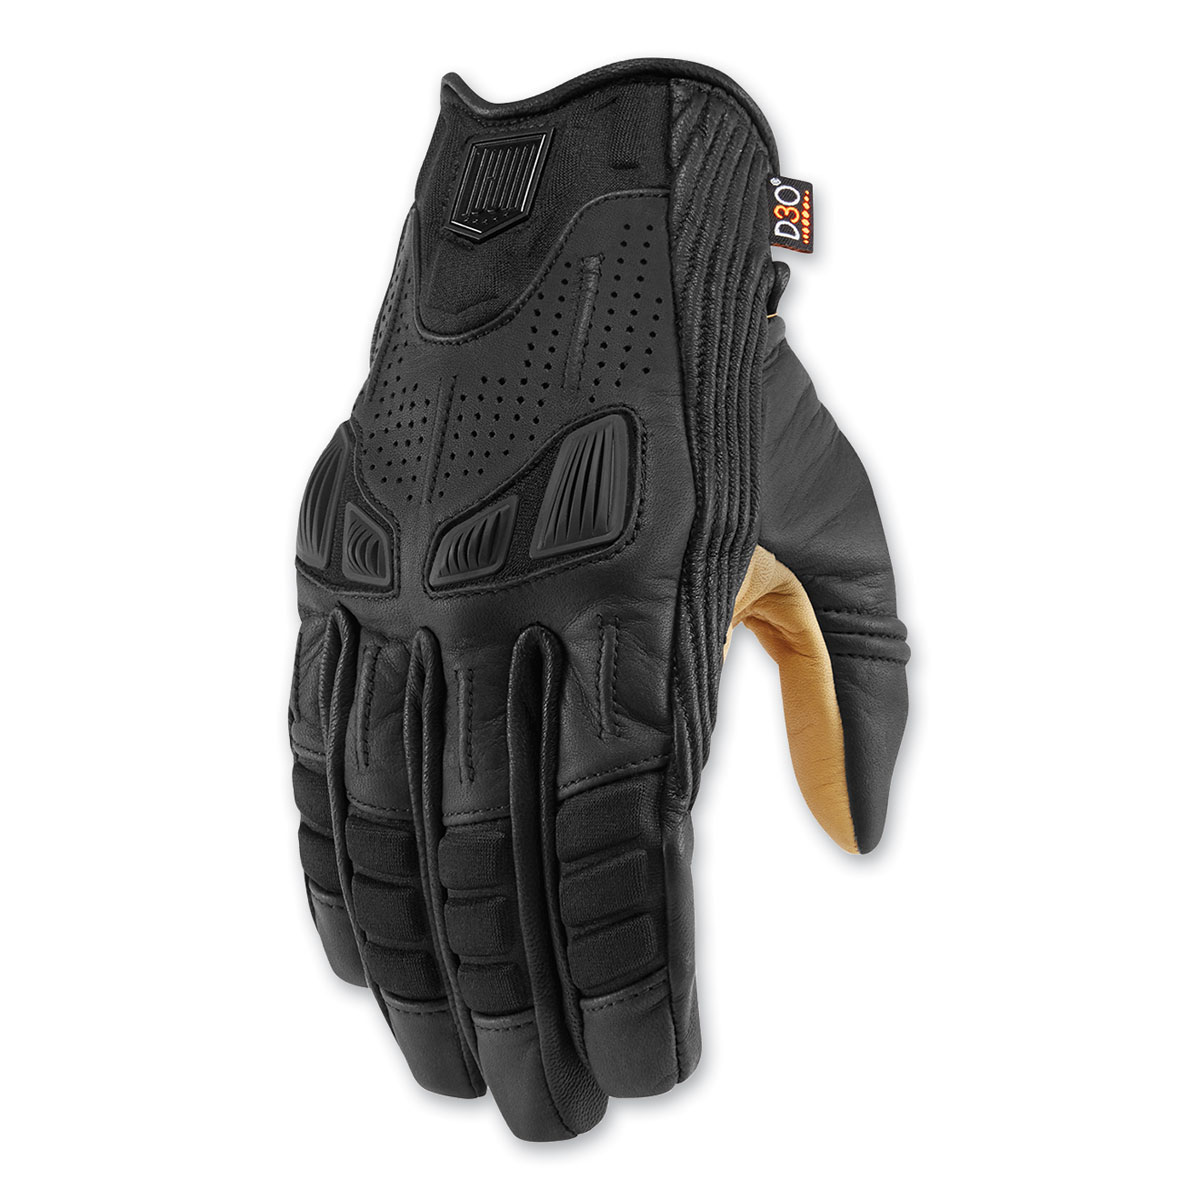 ICON One Thousand Men's Axys Black Gloves